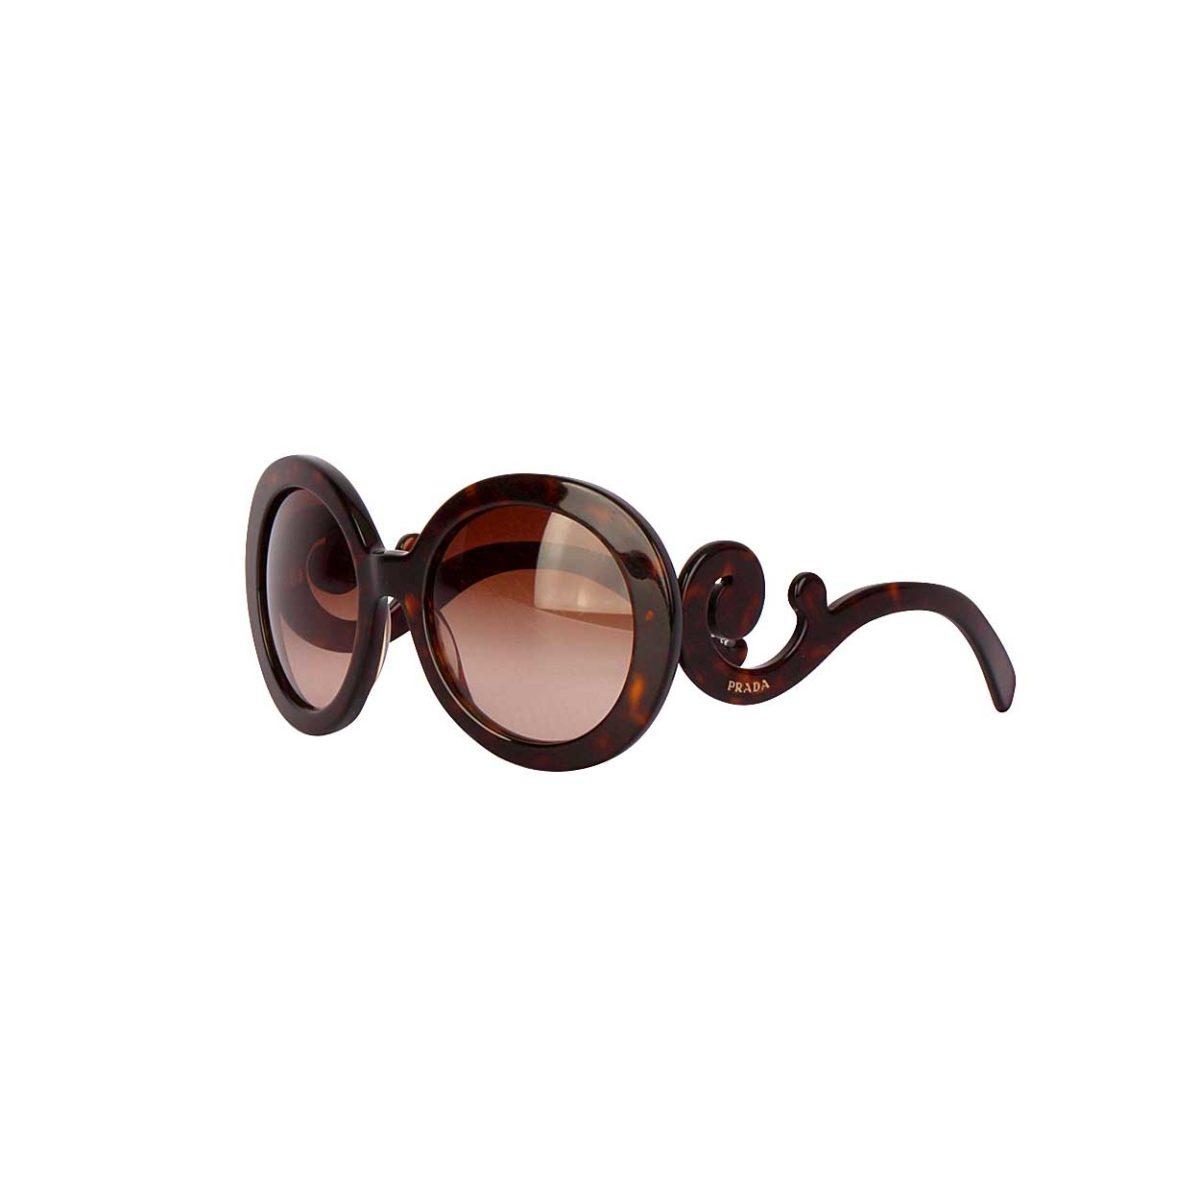 cdb053b1928 ... spr 27n tortoise 97284 8cd43 ef5af coupon code for prada tortoise  minimal baroque sunglasses spr27n 10505 58ff8 ...